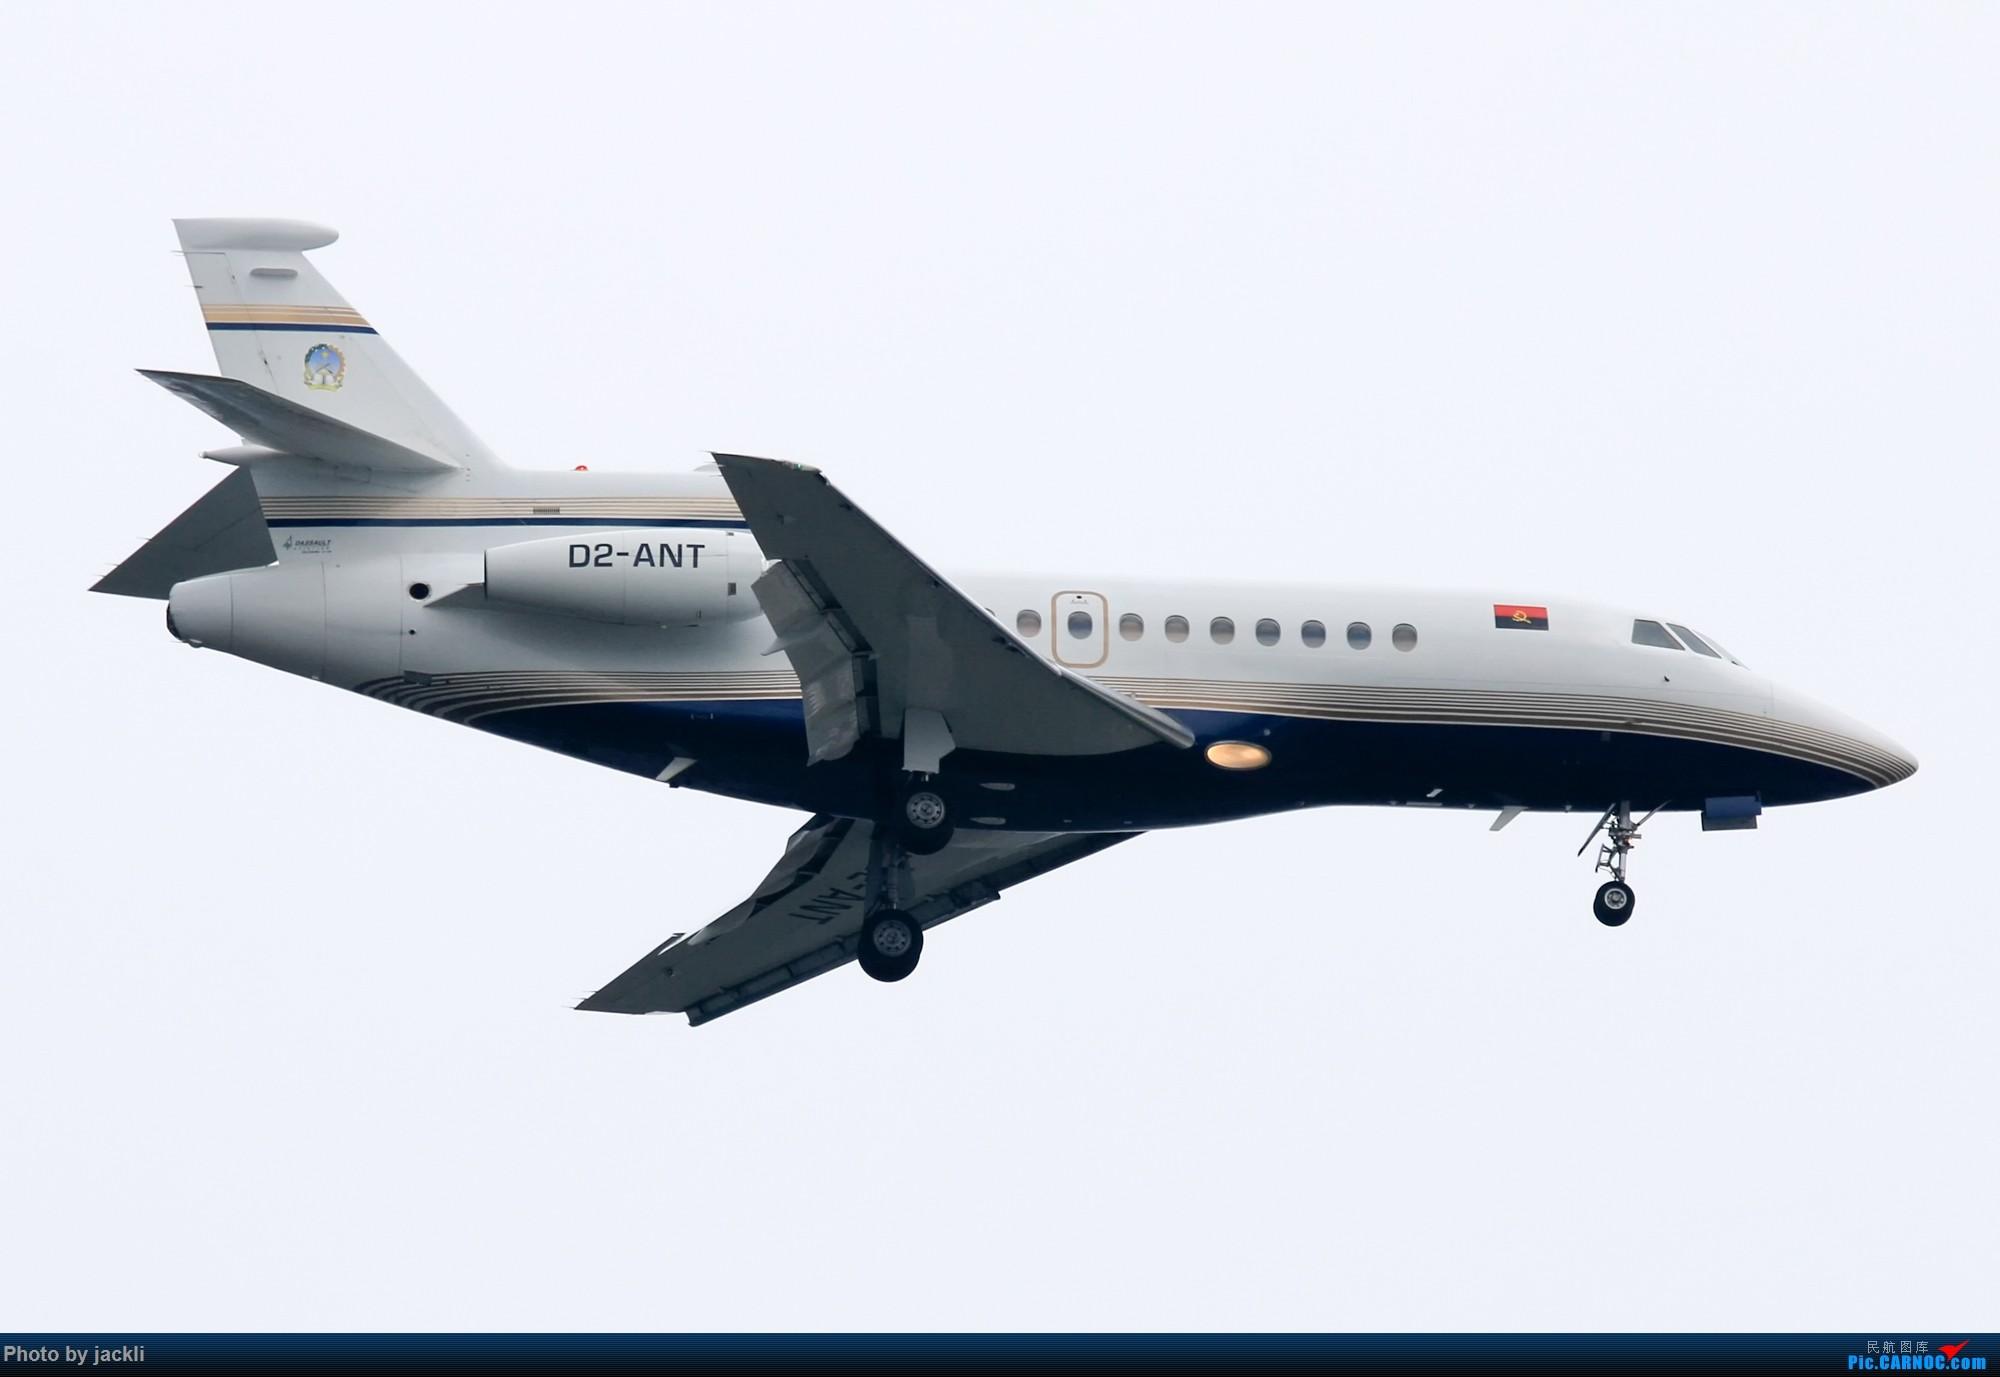 Re:[原创]【JackLi拍机+游记】北京首都机场拍机+参观民航博物馆+首次体验国航A350~ DASSAULT FALCON 900B D2-ANT 中国北京首都国际机场